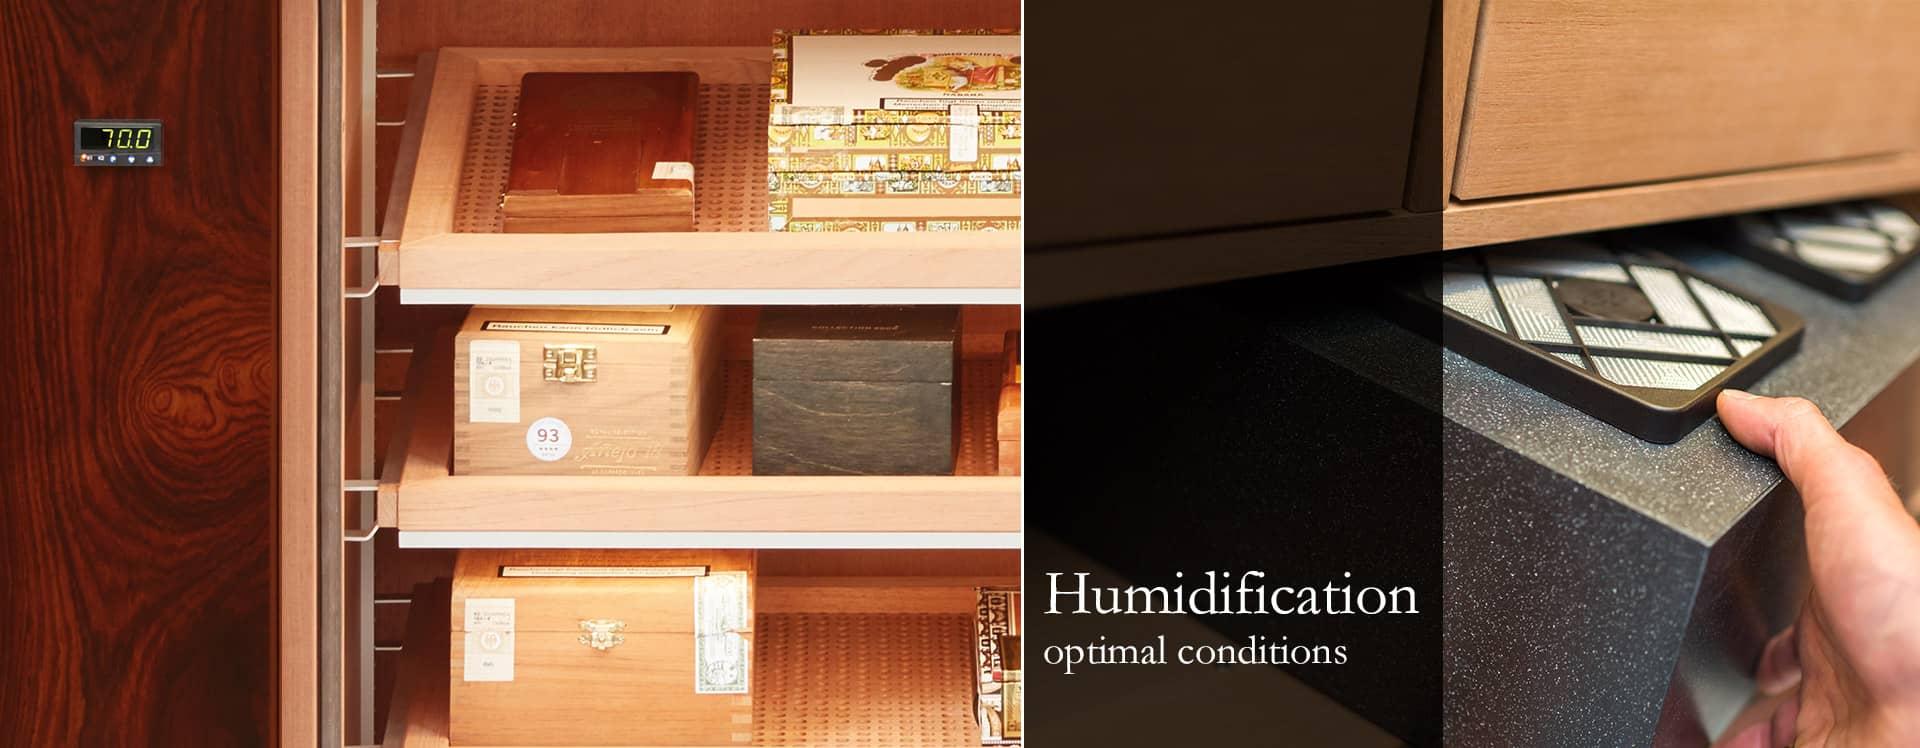 Humidification Gerber Humidor